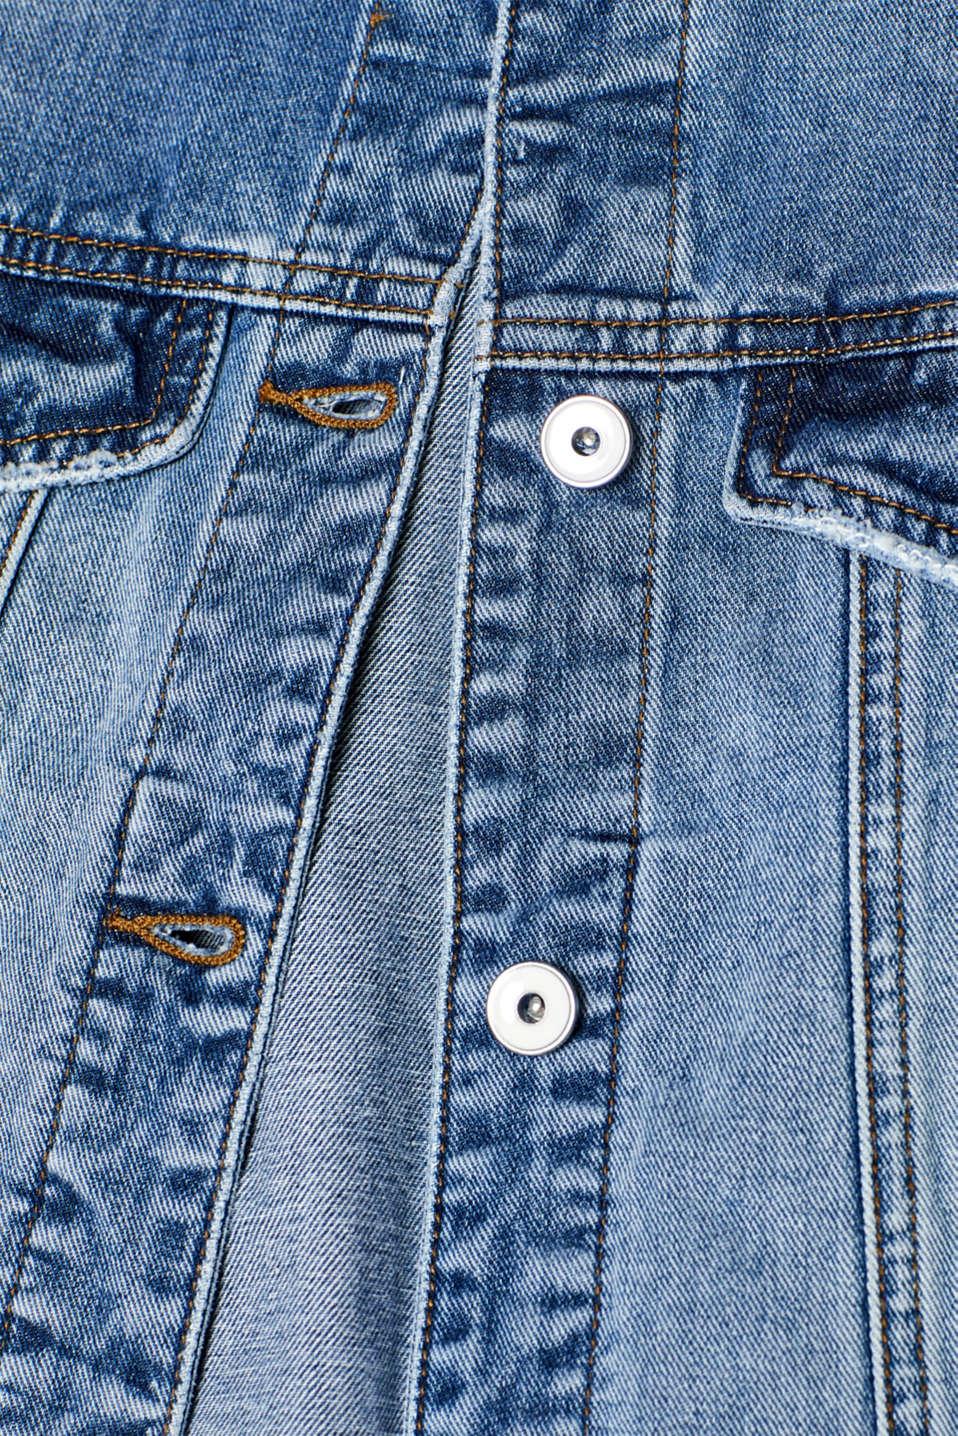 Jackets indoor woven, BLUE MEDIUM WASH, detail image number 4